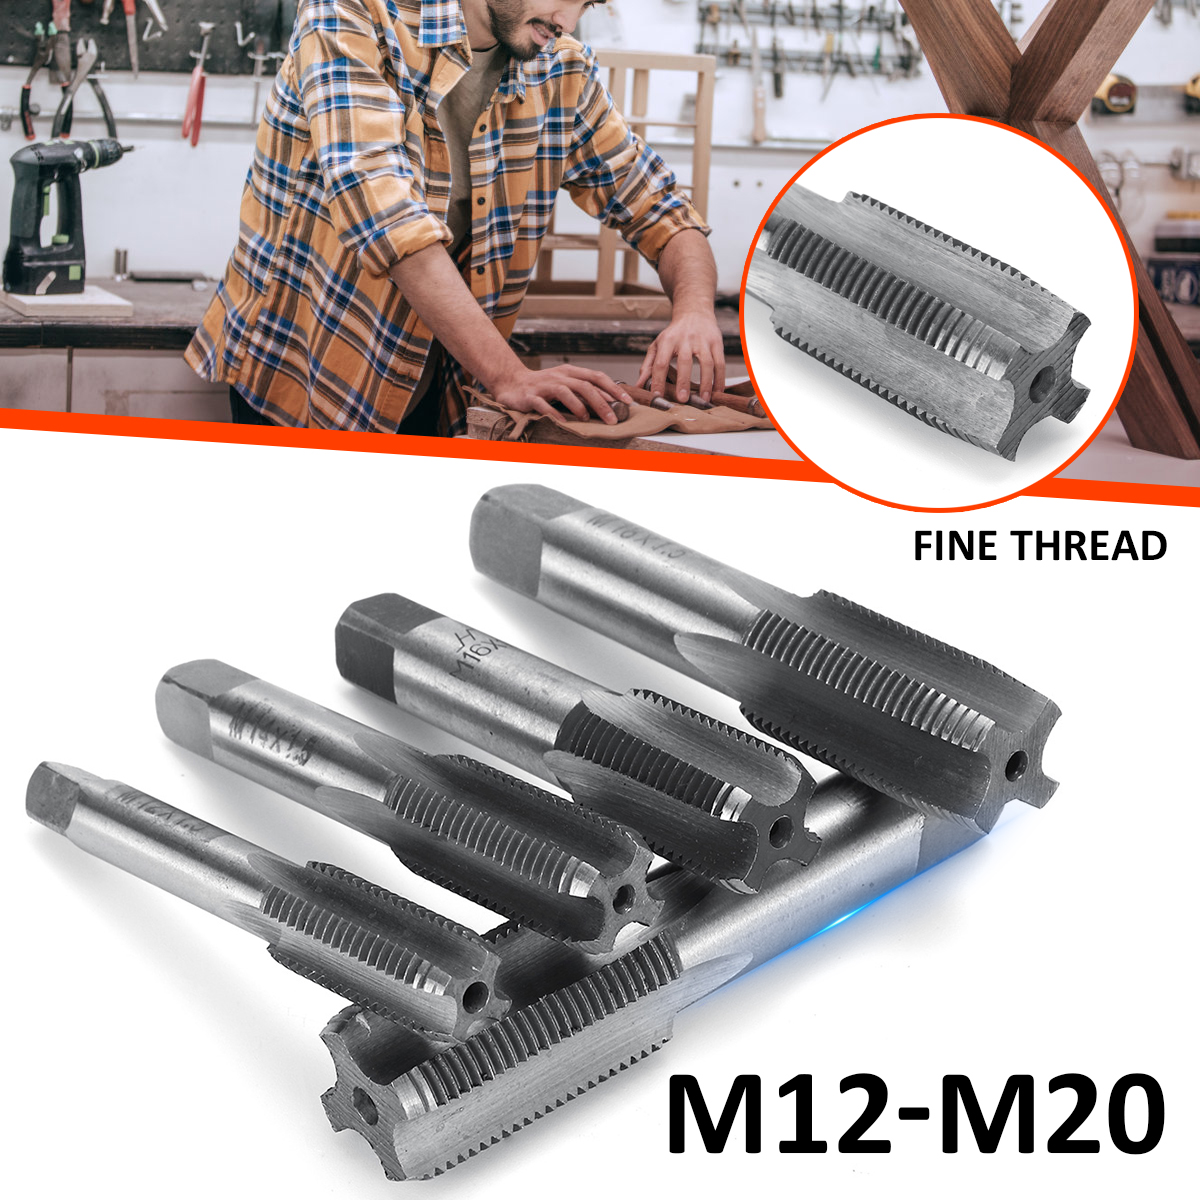 2pcs M12 M14 M16 M18 M20 HSS Right Hand Machine Straight Fluted Fine Screw Thread Metric Plug Hand Tap Drill Set Hand Tools